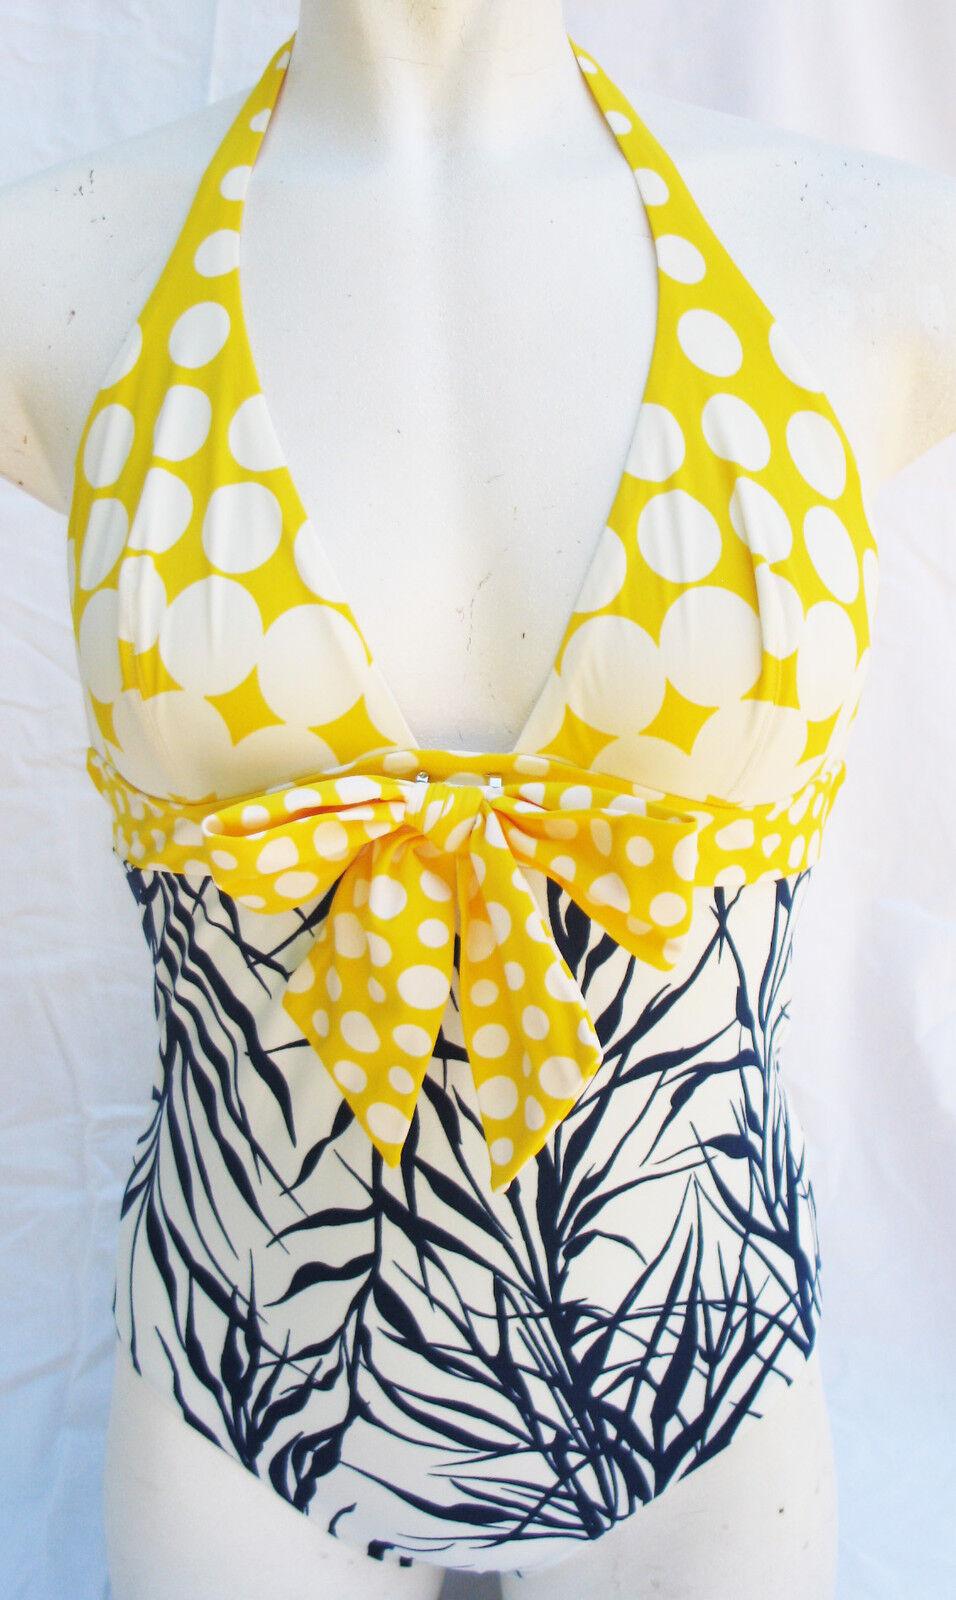 Bañador Andres Sarda Barcelona size S Nuevo small  one-piece swimsuit